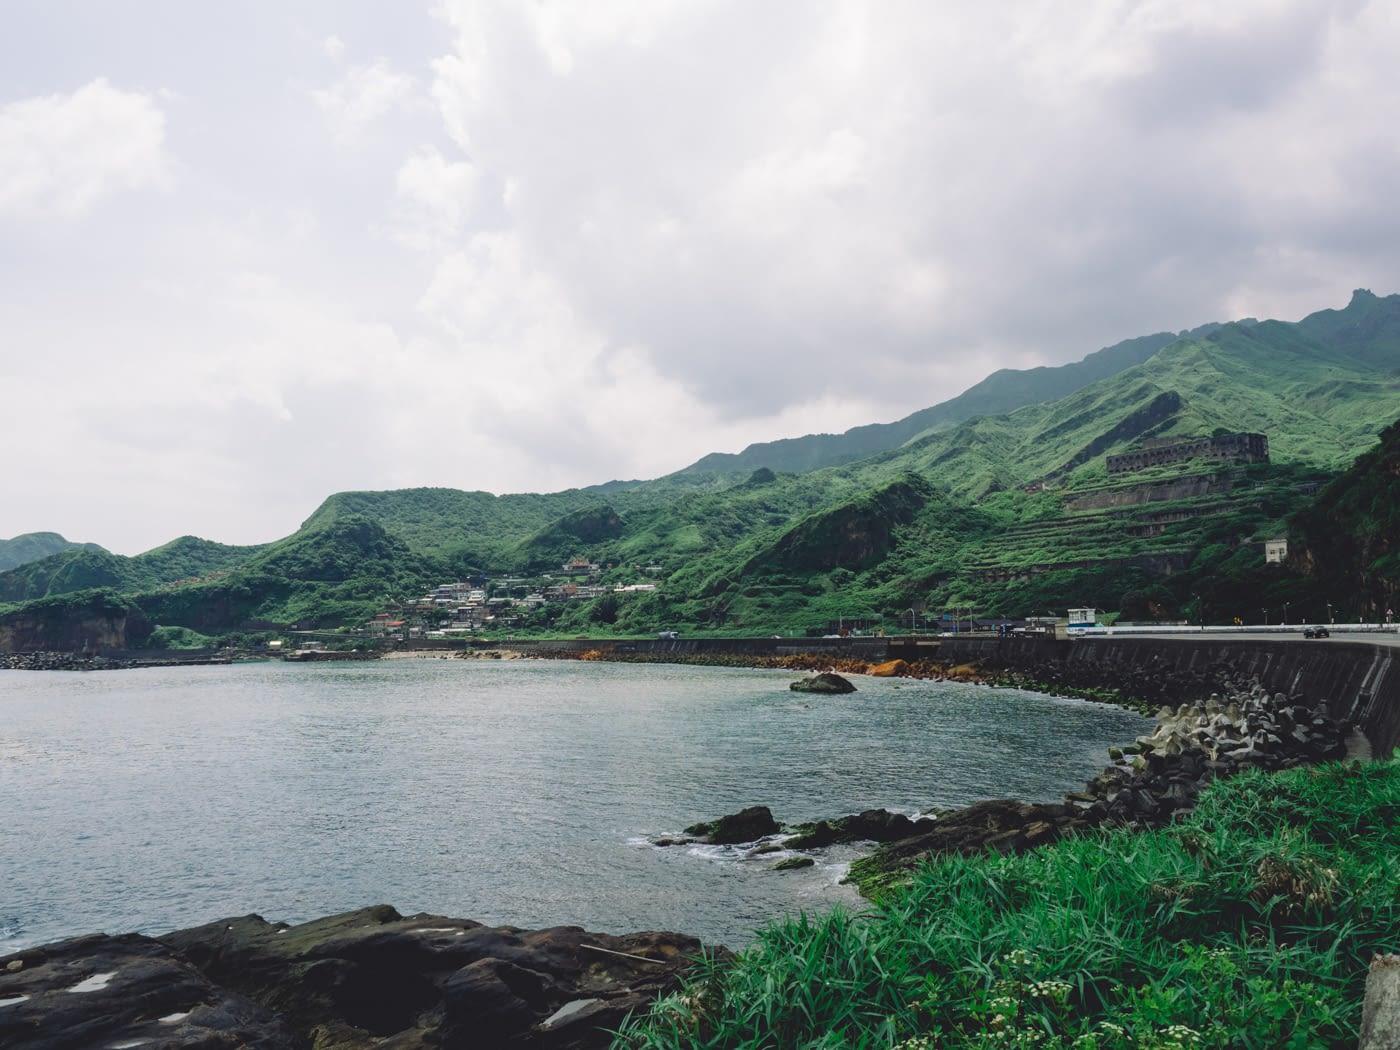 Taiwan - New Taipei City - Amazing greenery mountain